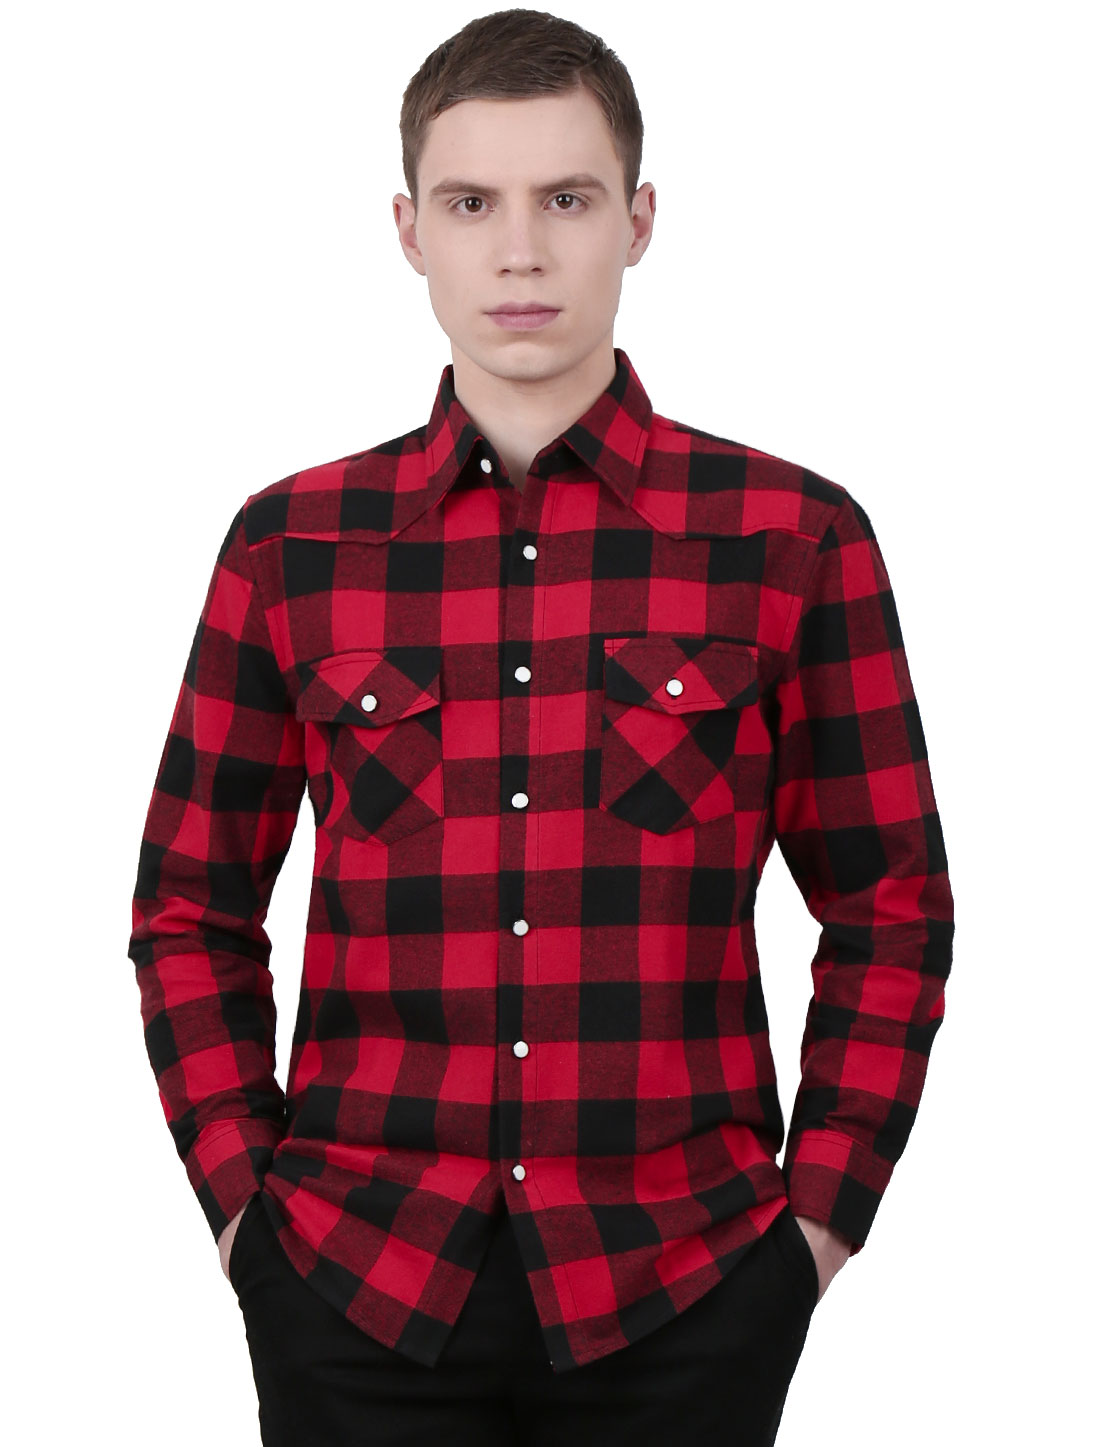 Men Long Sleeve Chest Pockets Button Down Slim Fit Shirt Red Black L